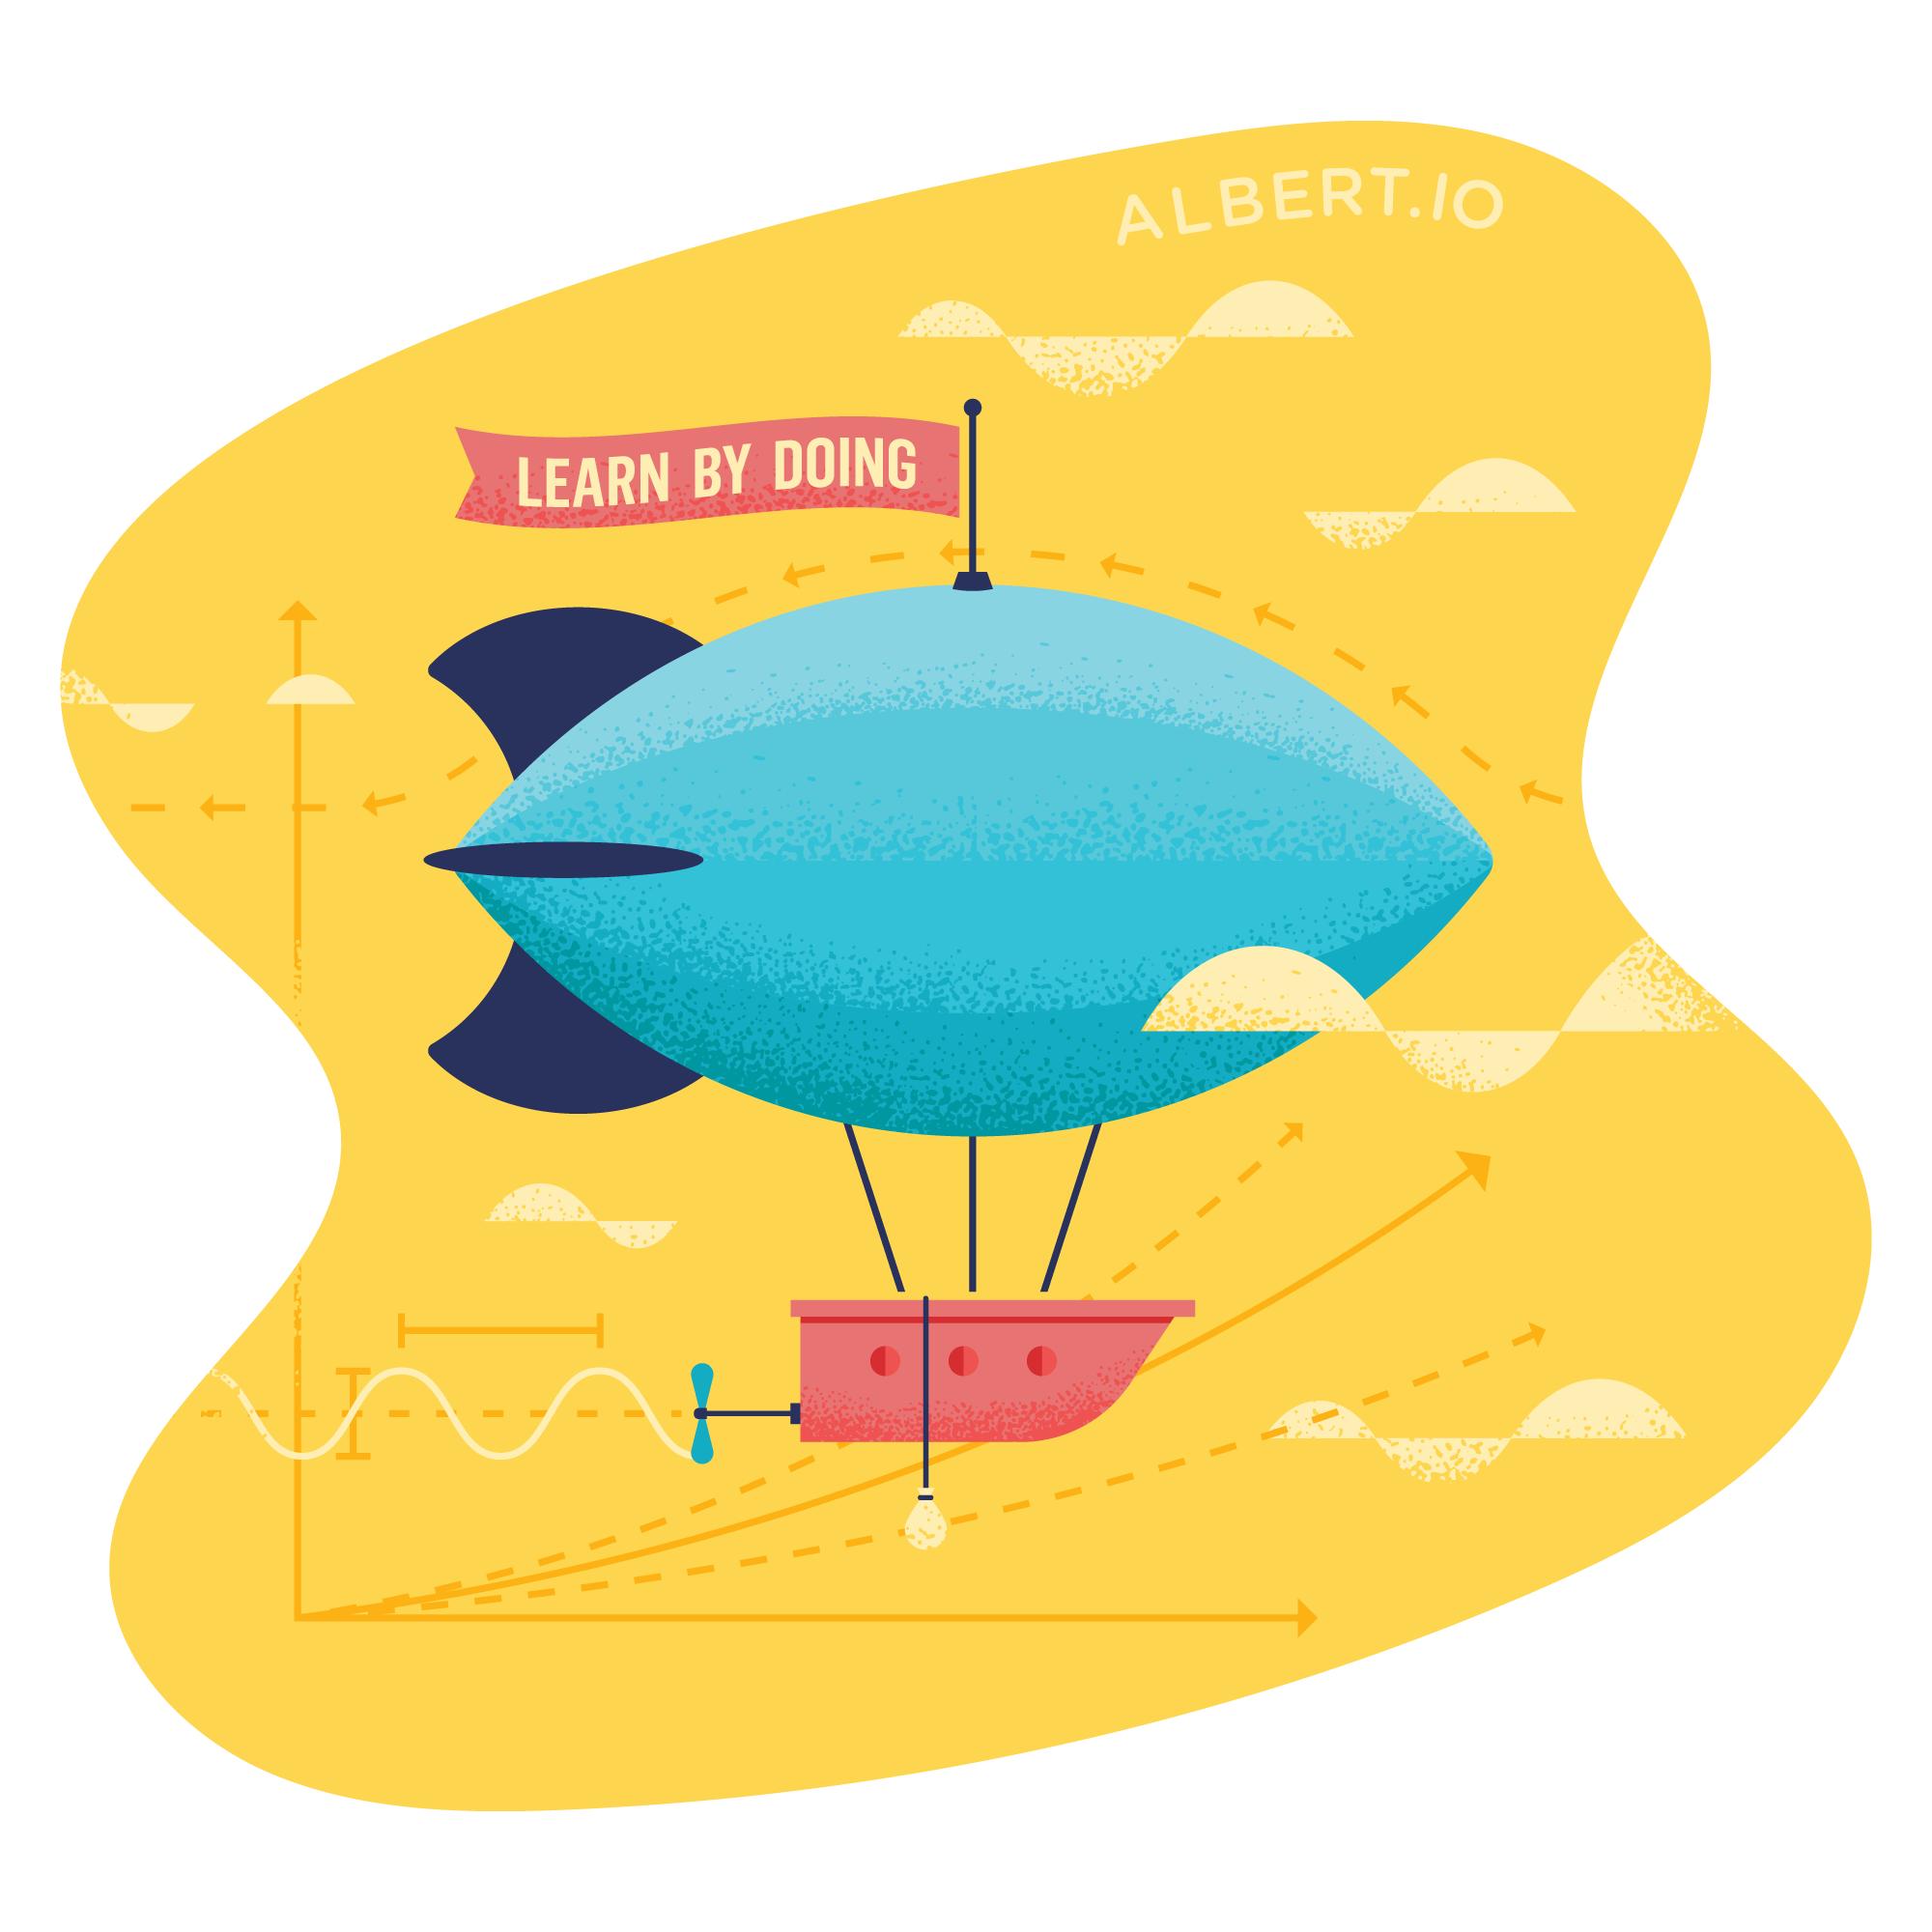 Albert.io_airship_final.png